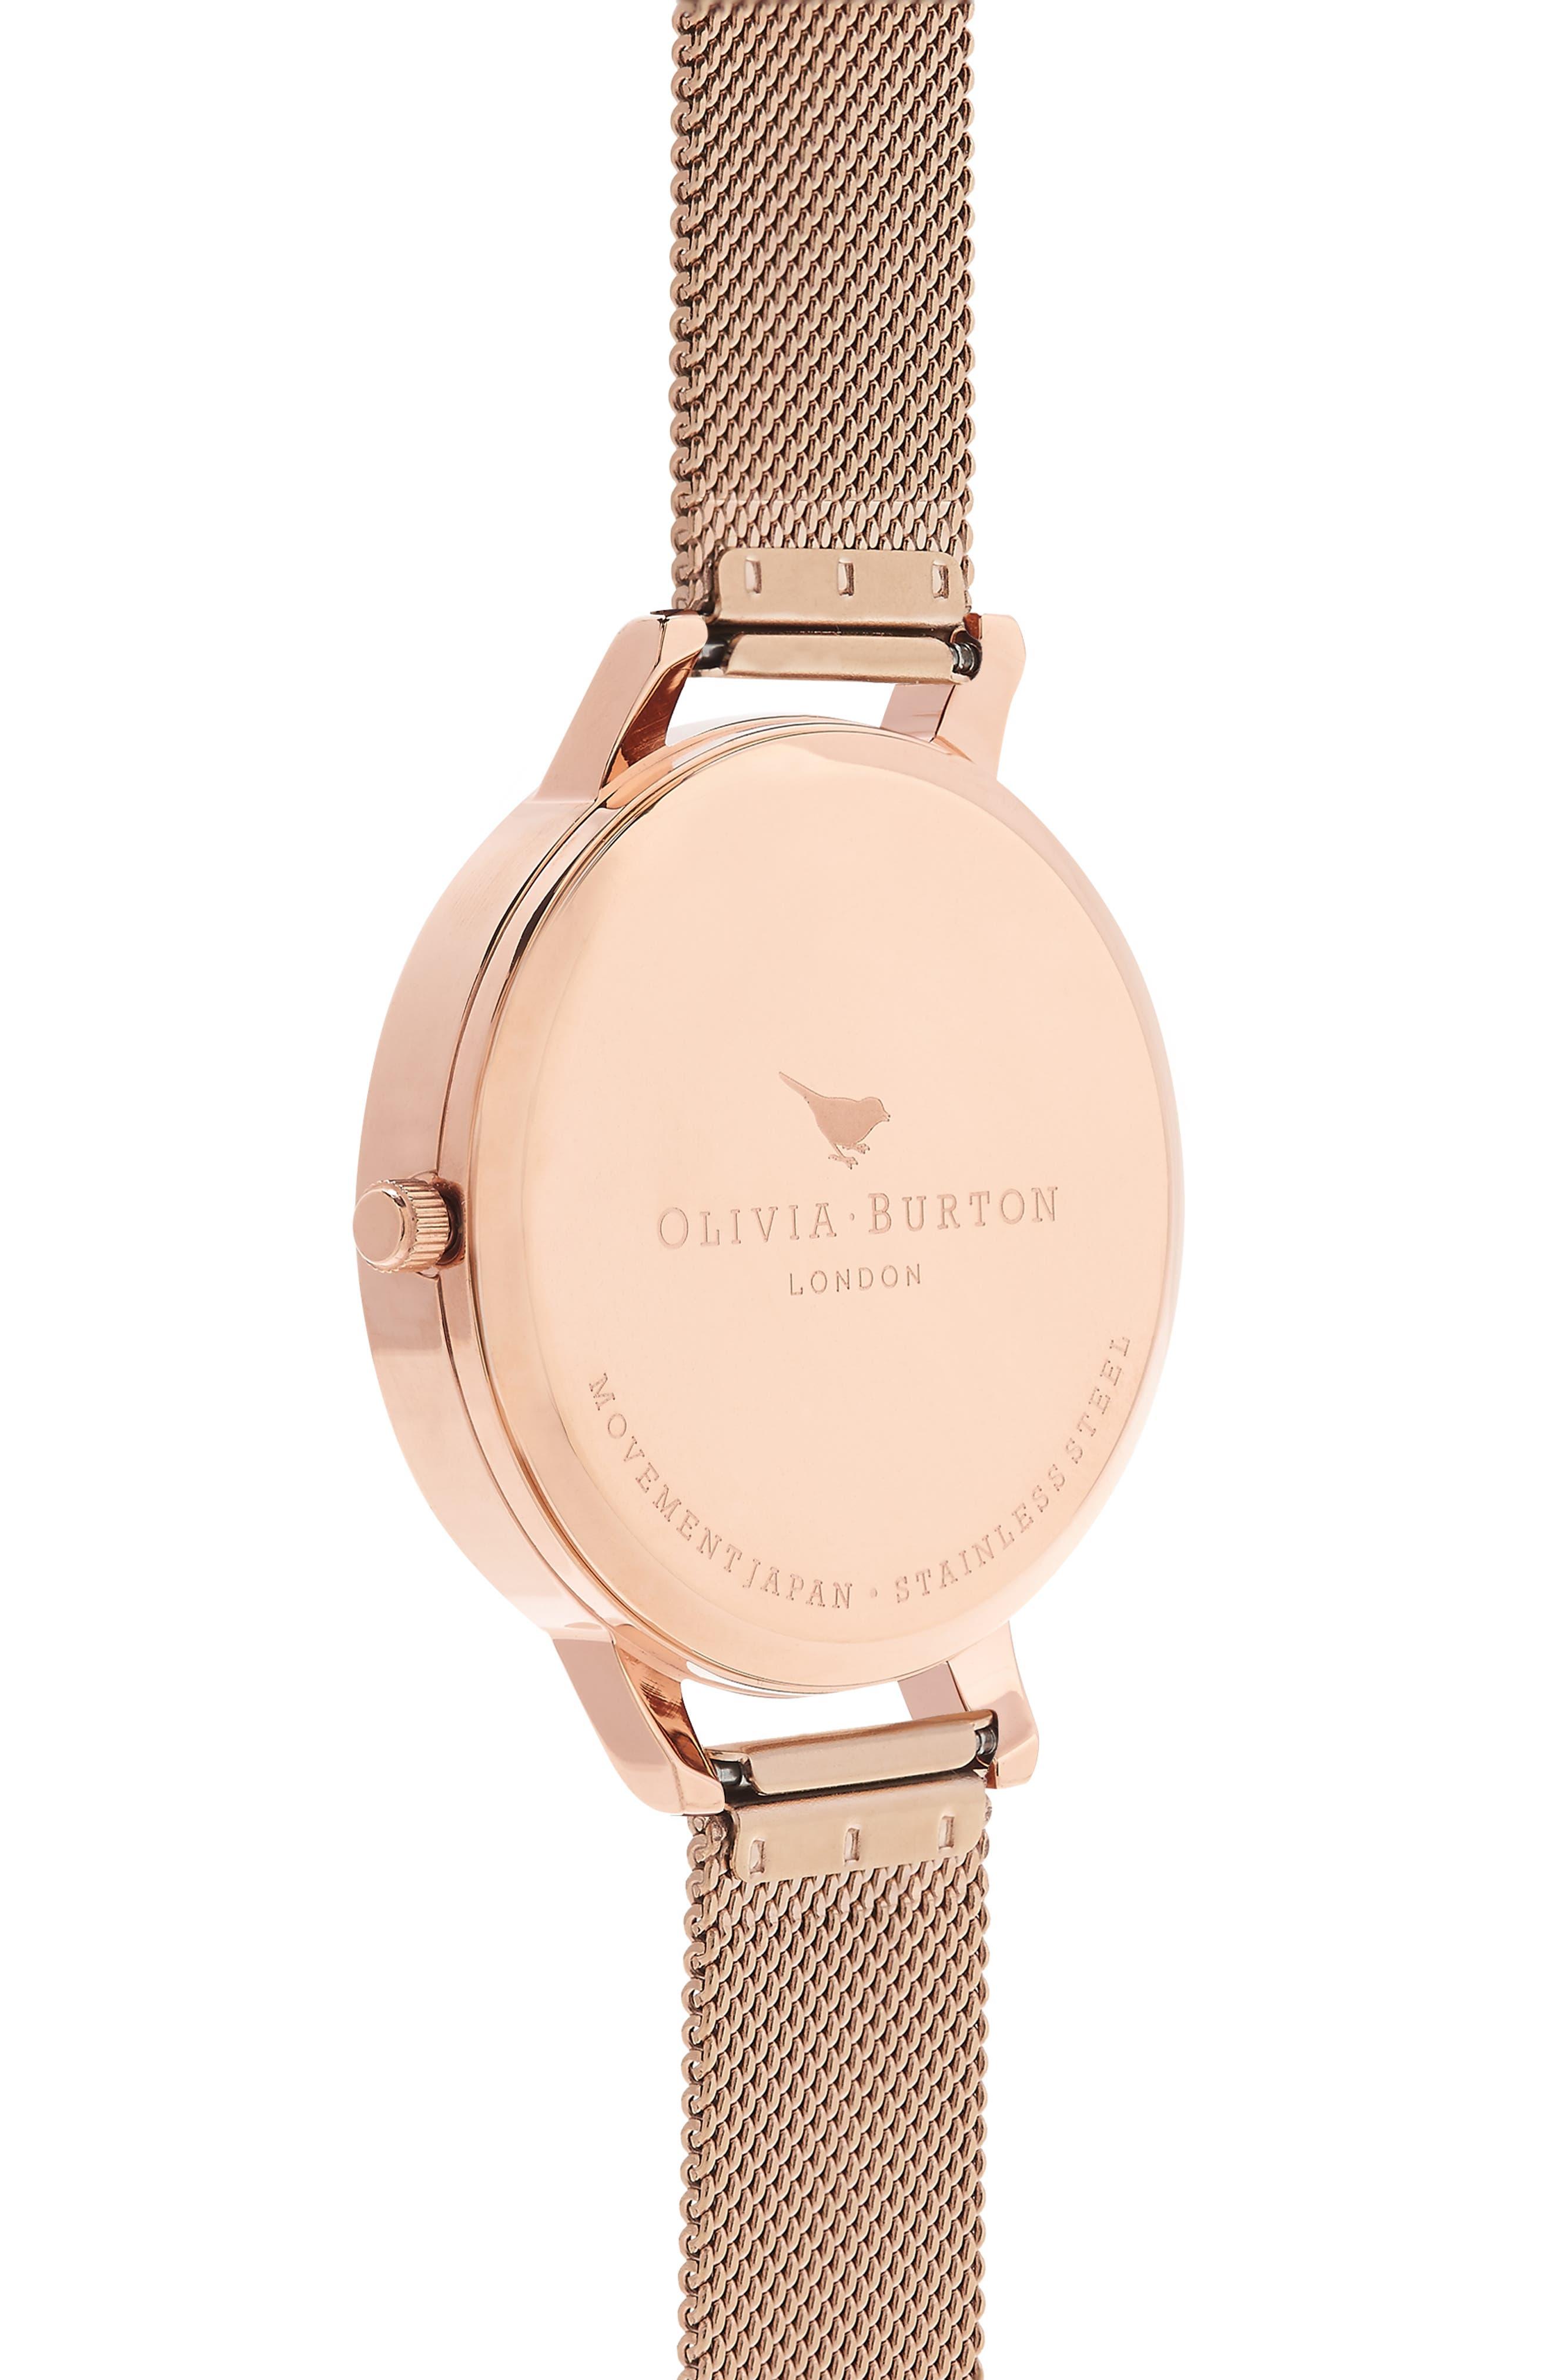 OLIVIA BURTON, Signature Florals Mesh Bracelet Watch, 38mm, Alternate thumbnail 3, color, ROSE GOLD/ ROSE GOLD/ WHITE